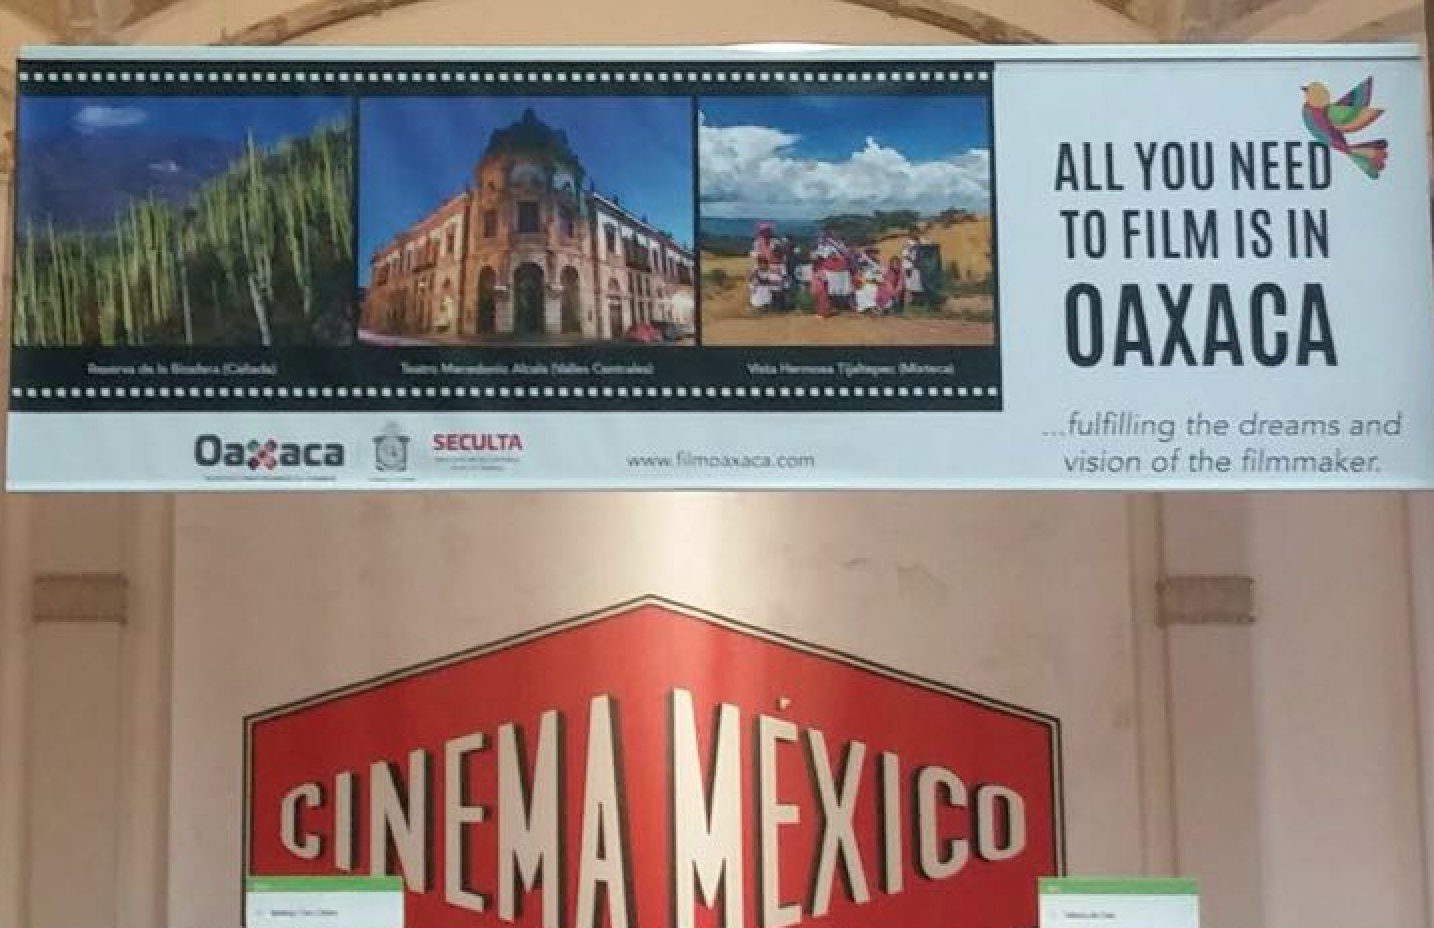 Foto de Cartelería Oaxaca Film Comission